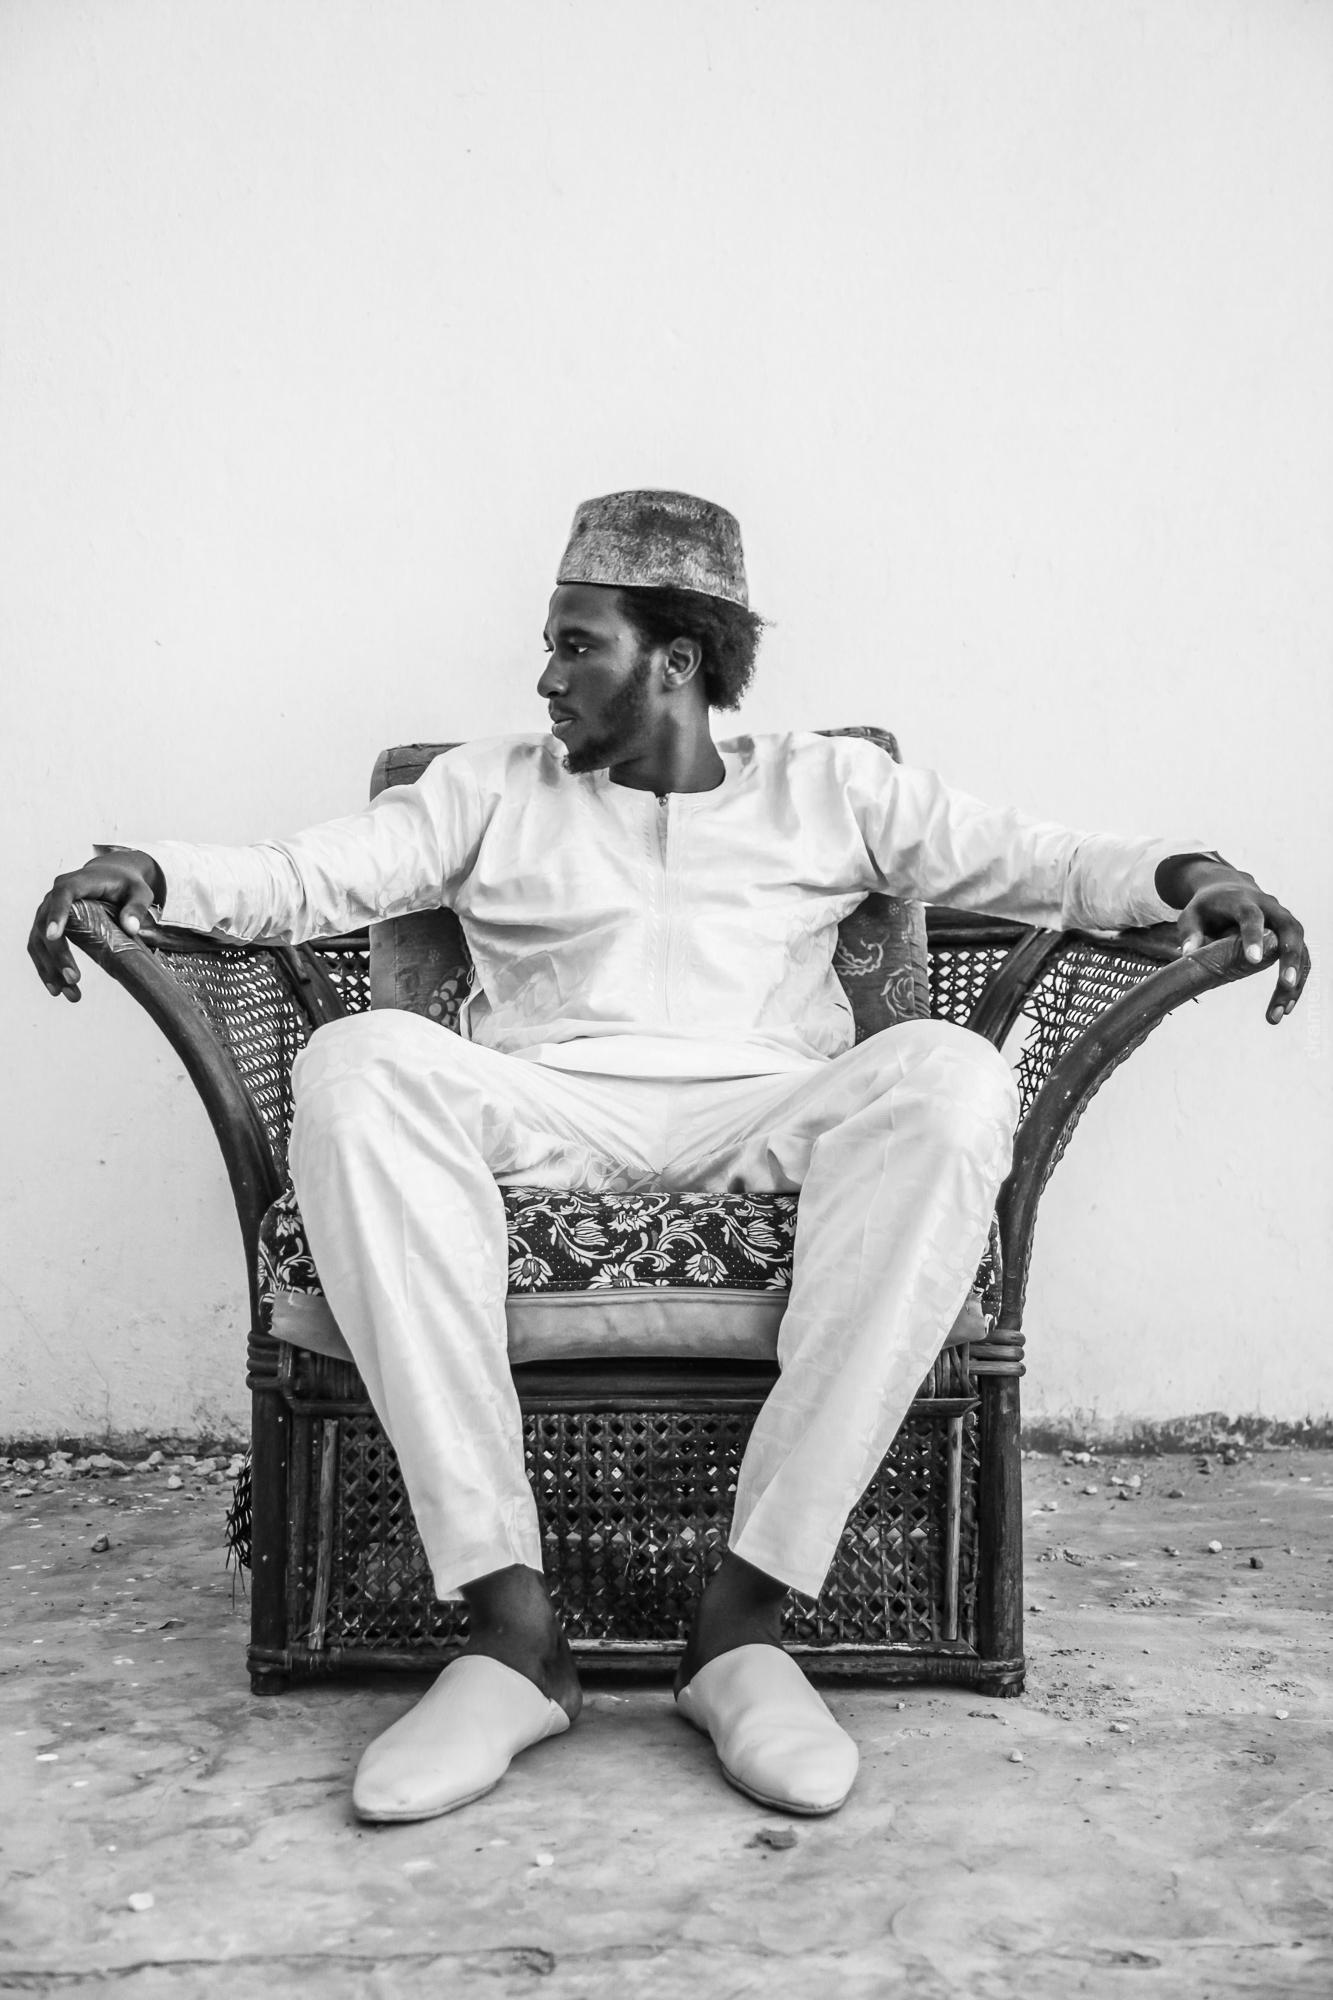 PortraitsofTabaskifiest-Senegal-10.jpg